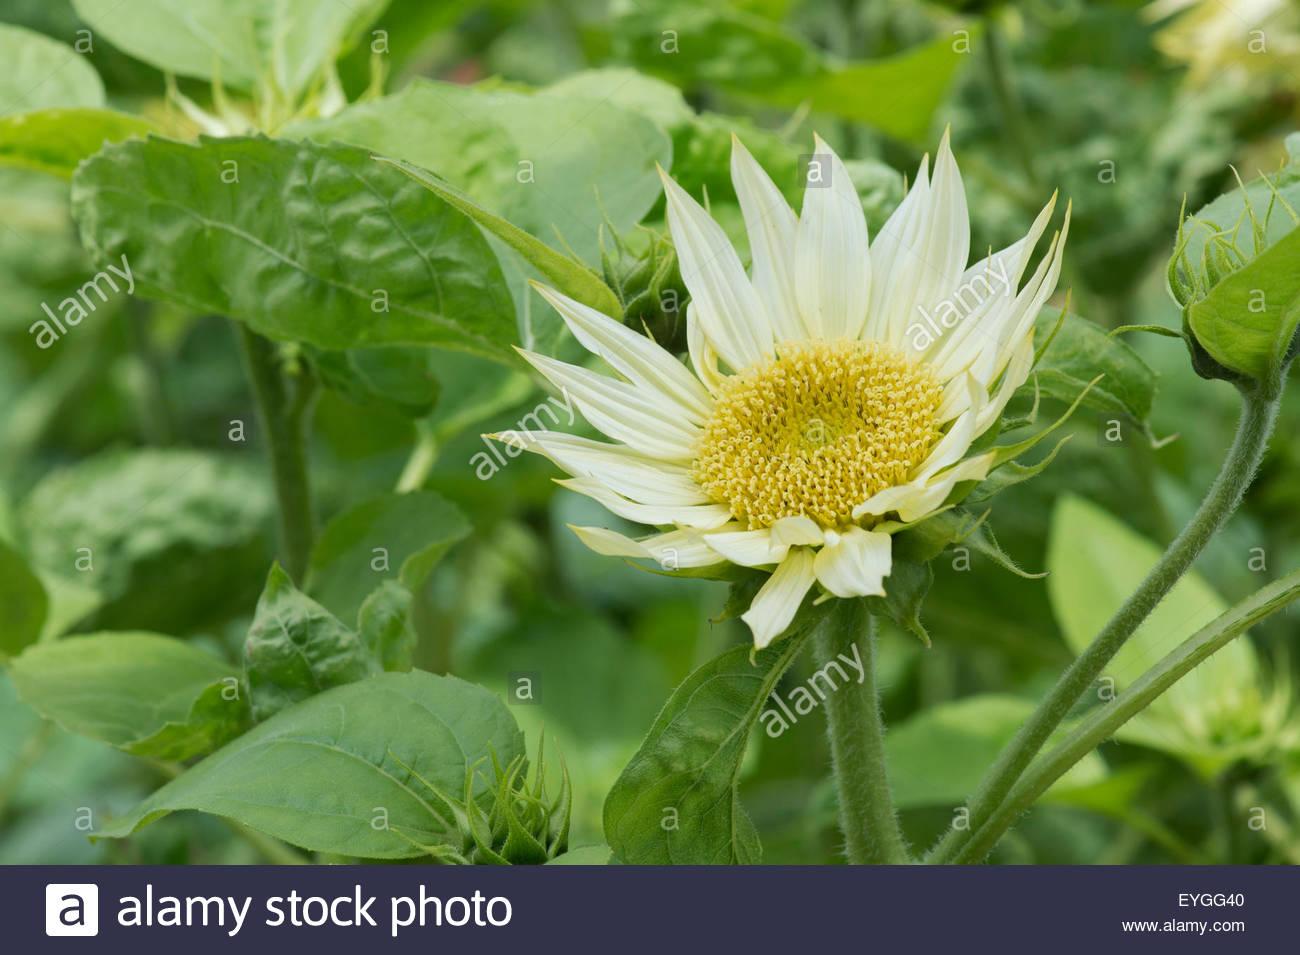 Helianthus annuus. Sunflower 'Jade' - Stock Image